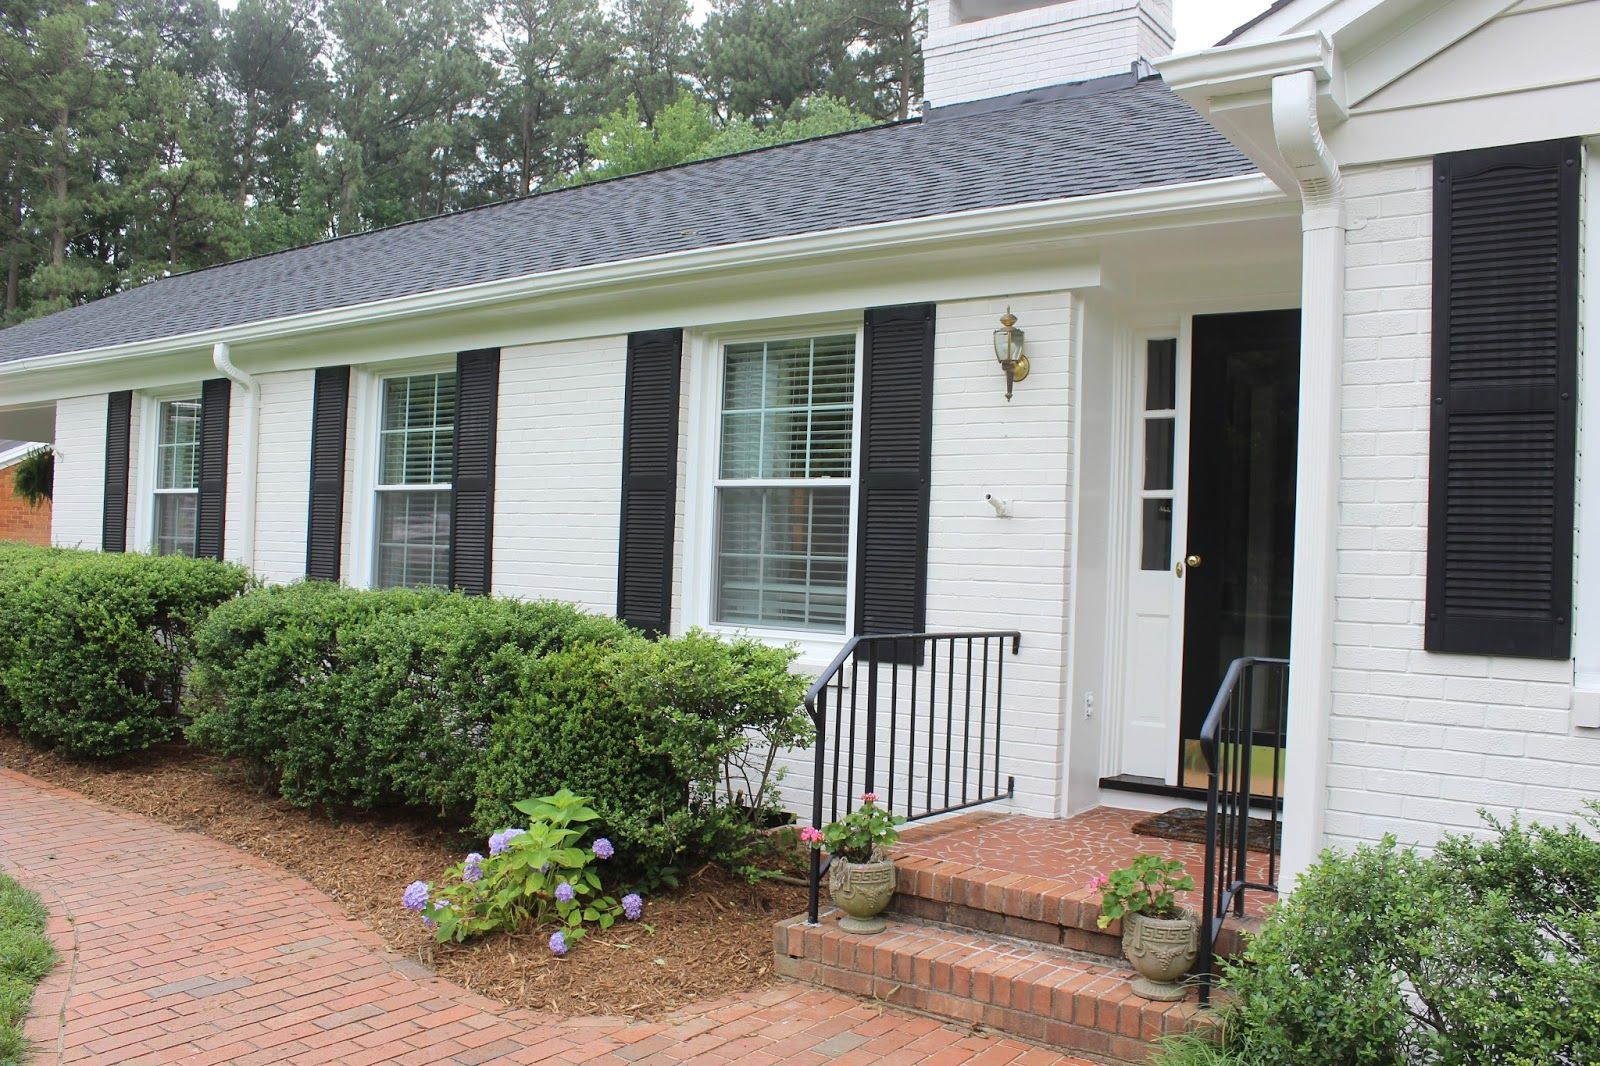 Exterior Magnificent Home Design Ideas With Brick Beam Exterior